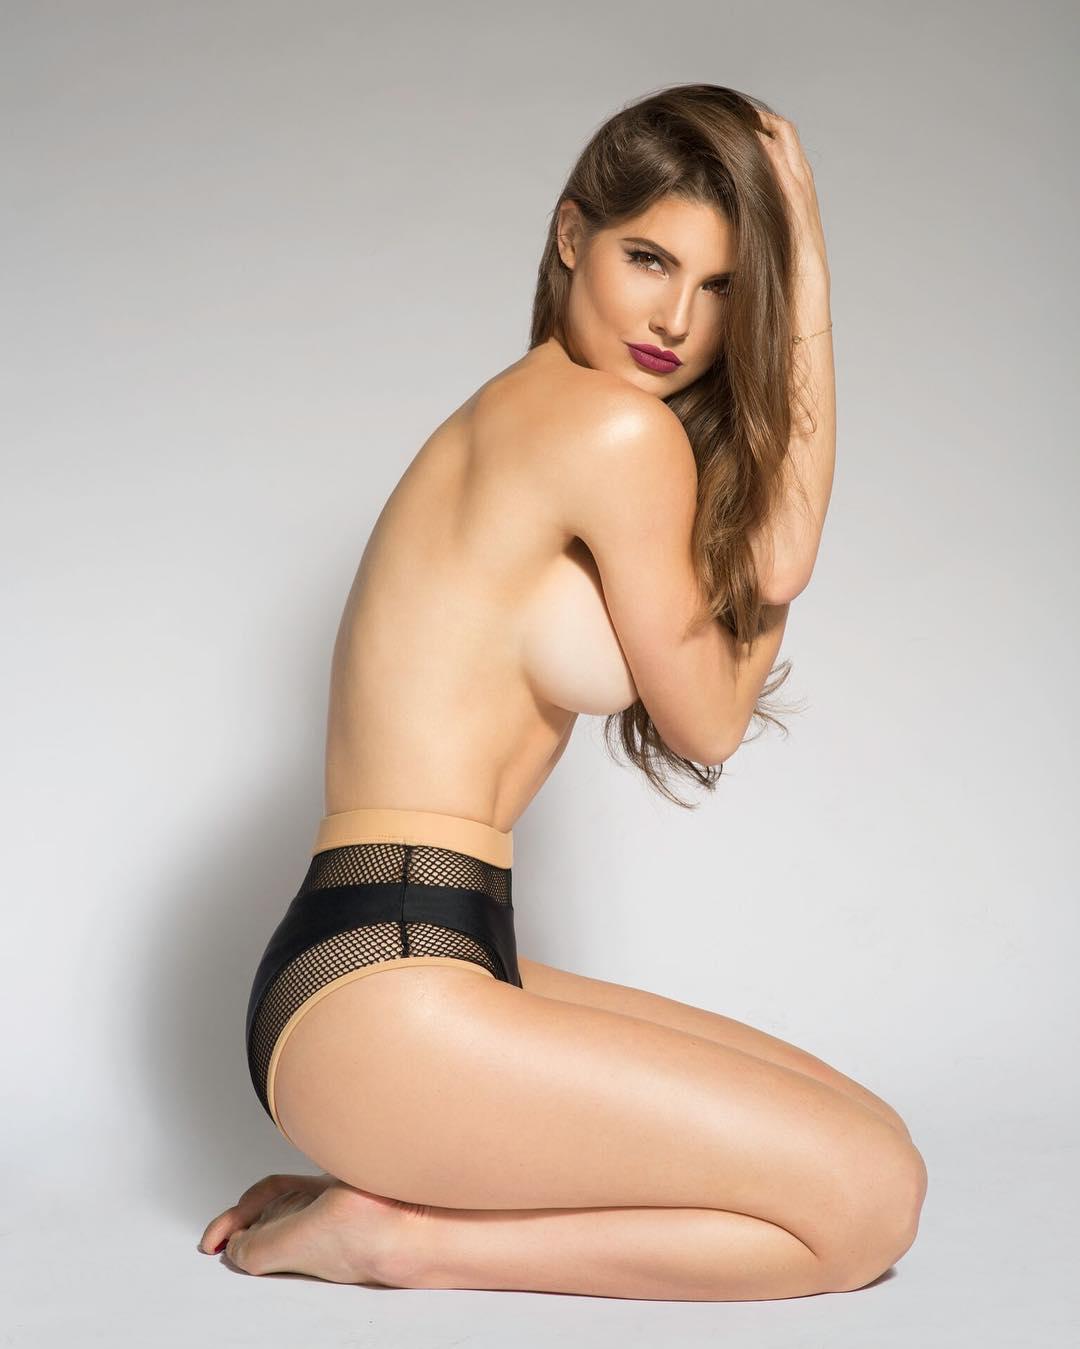 amanda cerny sex video